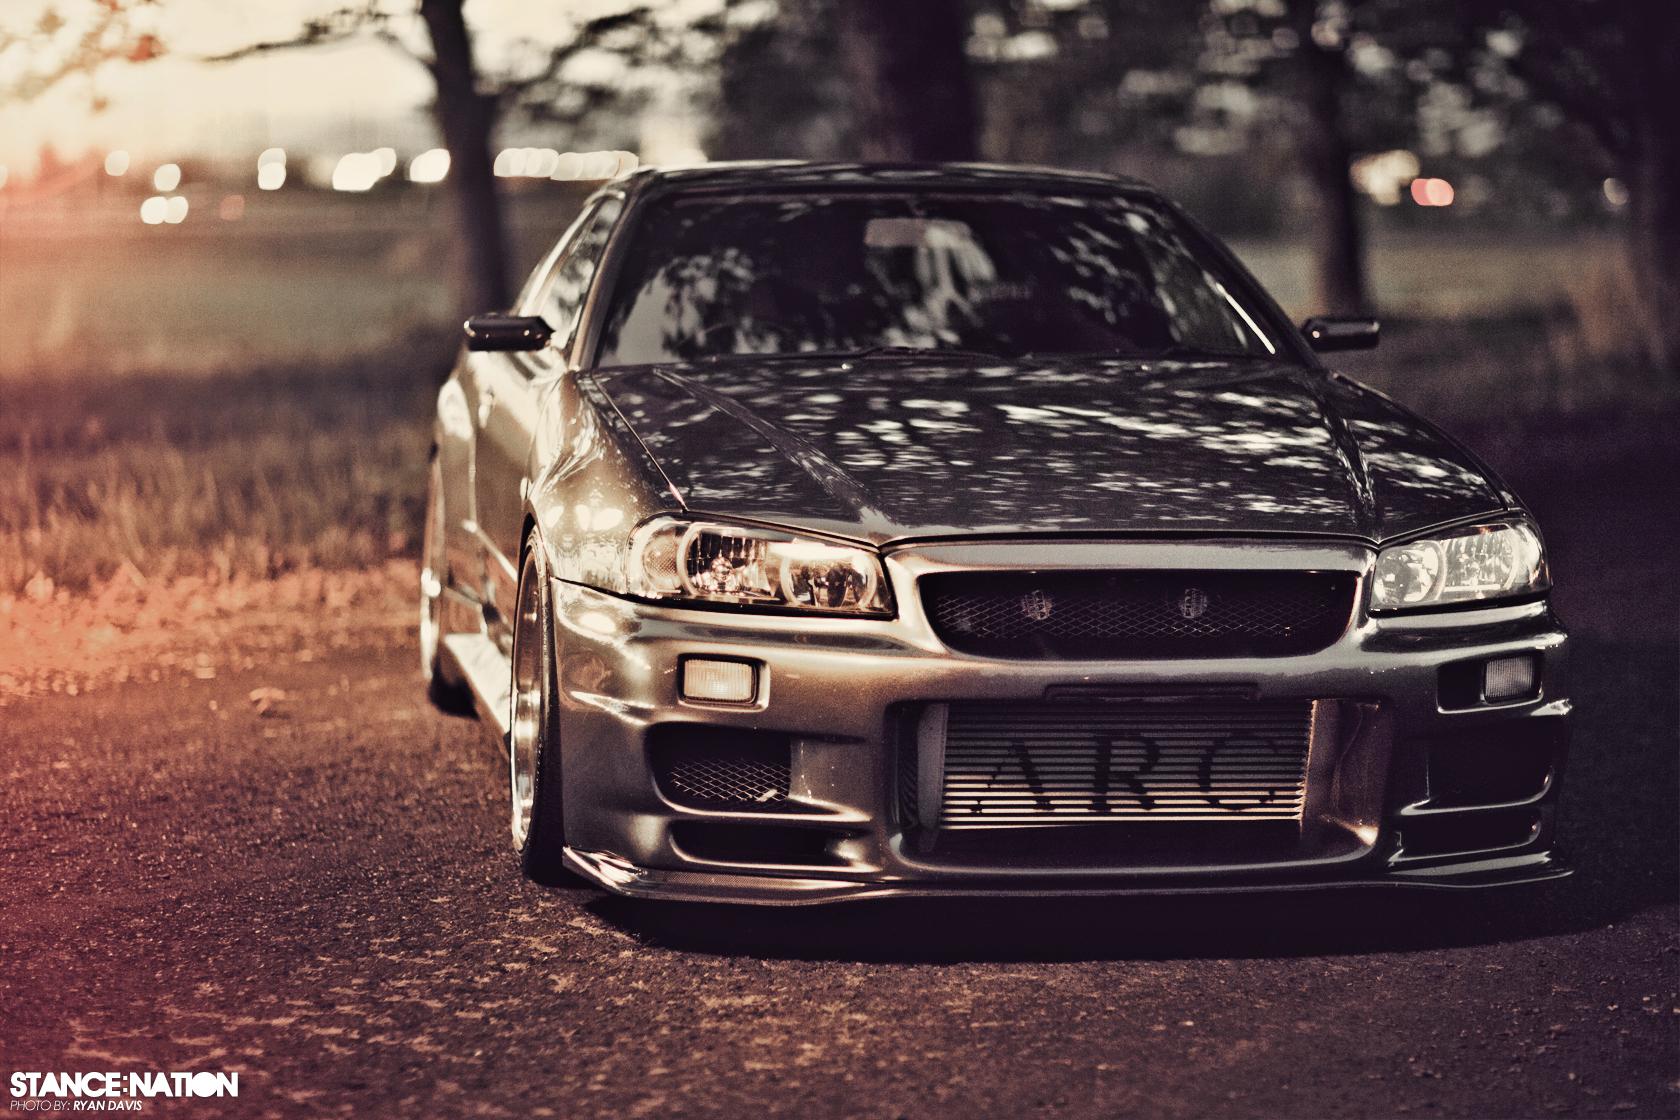 Skyline R34 GT-R